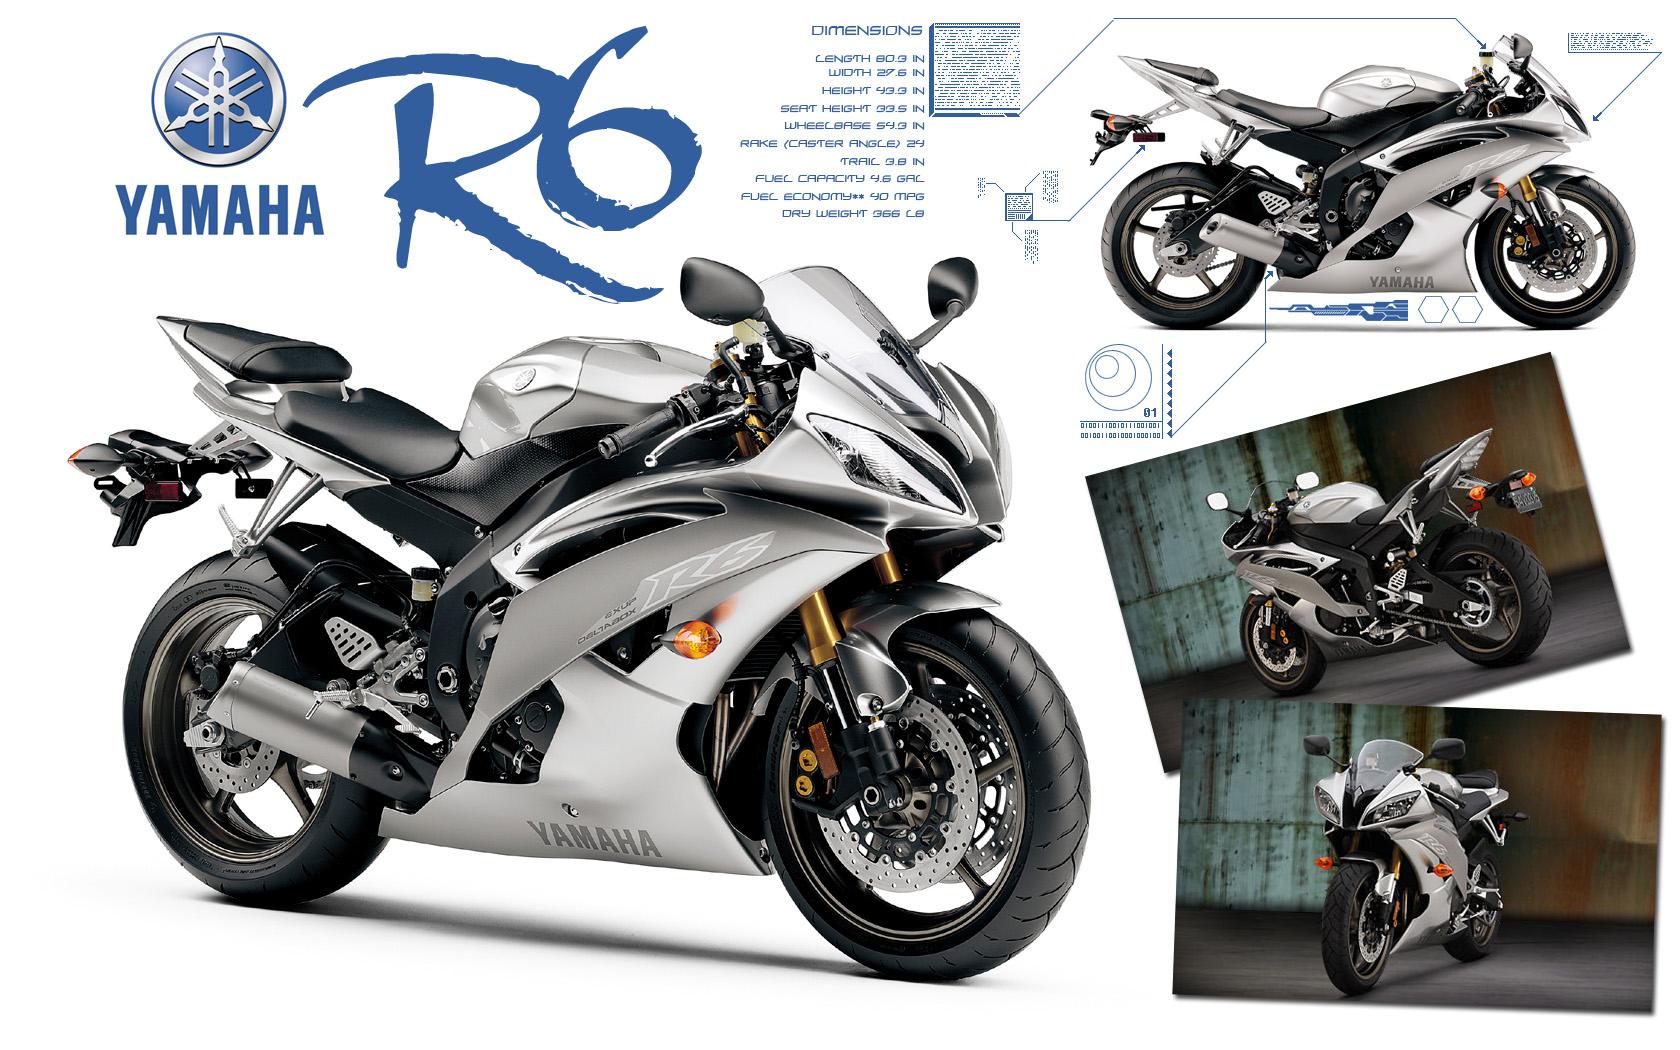 Yamaha R6 Wallpaper By Uneqstylez On DeviantArt